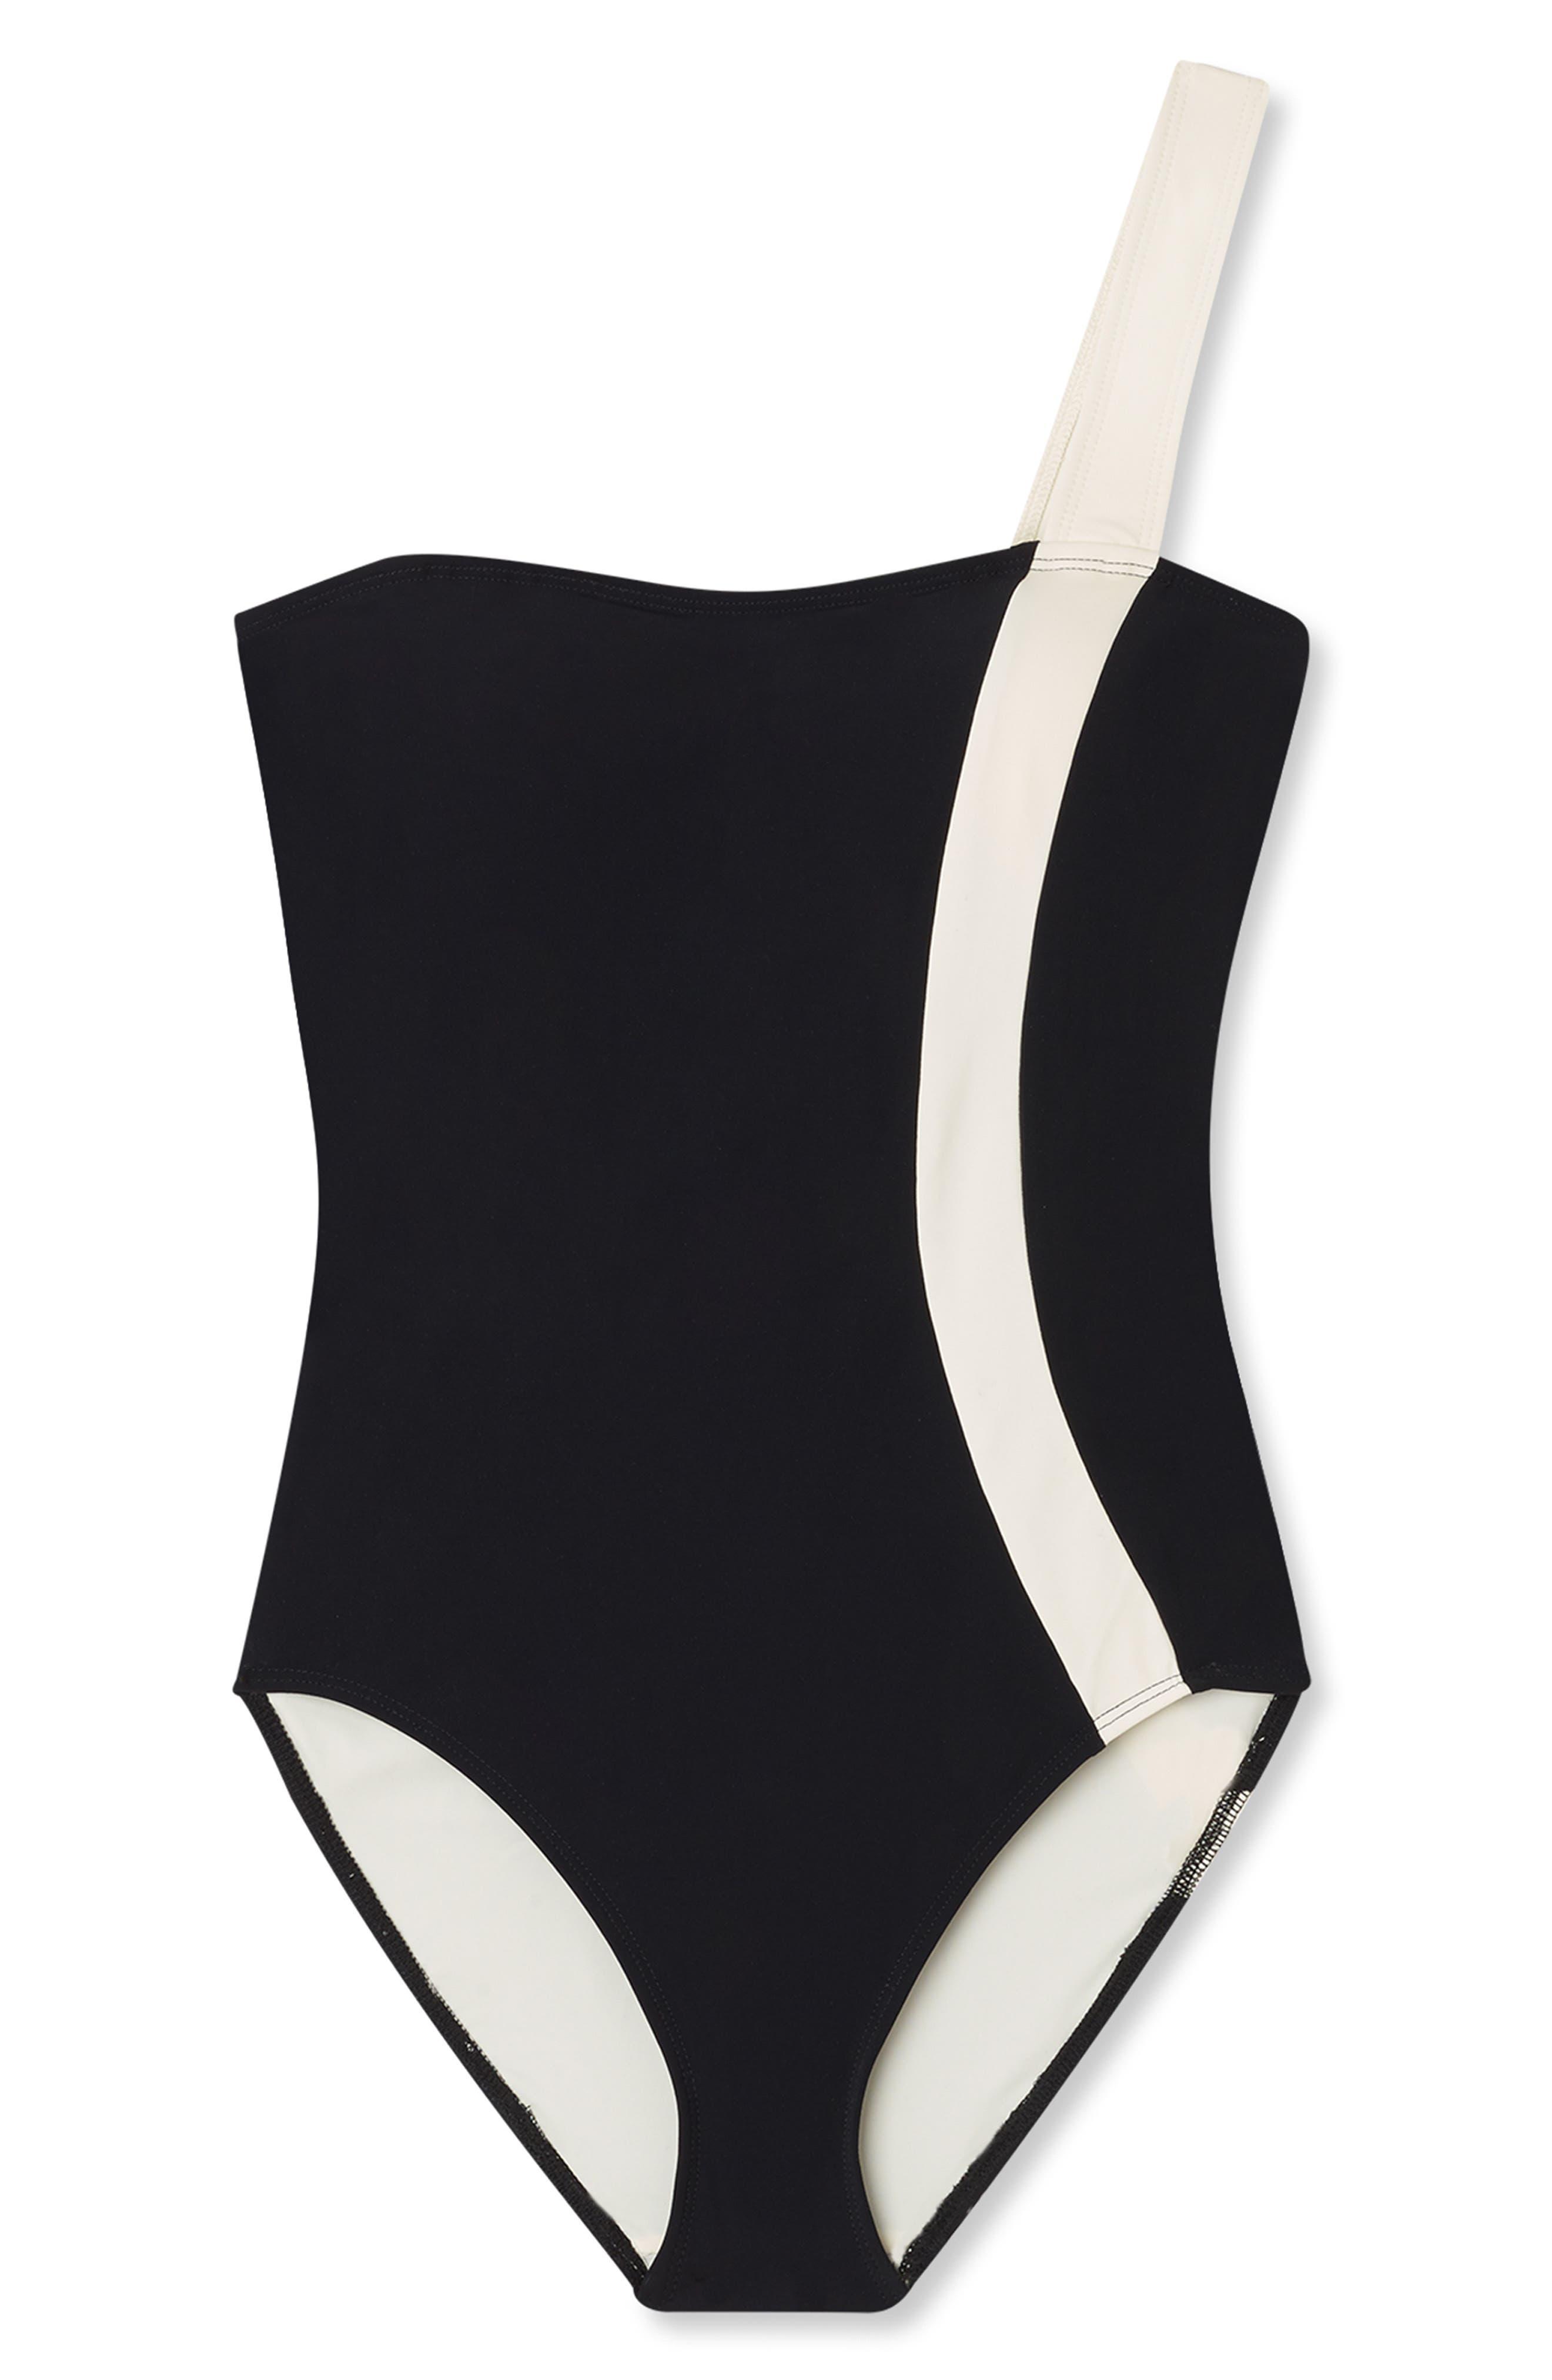 FLAGPOLE Calu One-Piece Swimsuit in Black/ Lychee